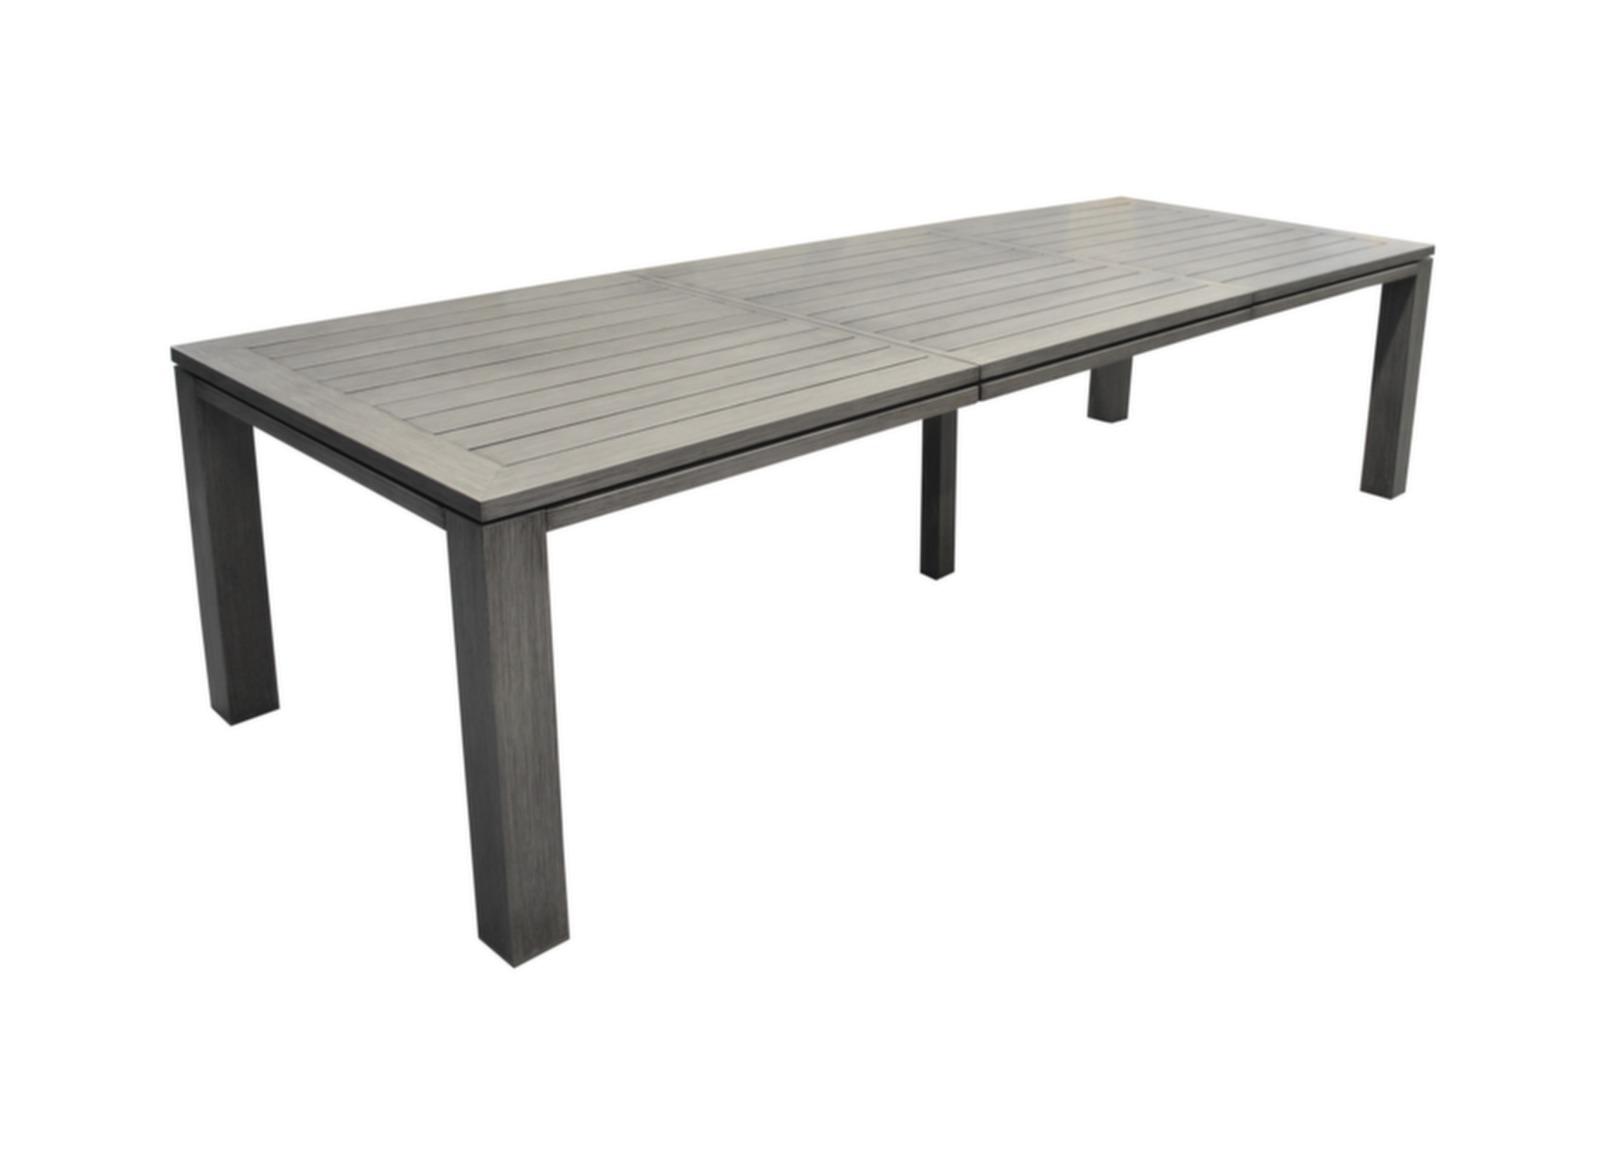 table latino 200 300 cm tables extensibles mobilier de jardin en ligne meubles de jardin. Black Bedroom Furniture Sets. Home Design Ideas